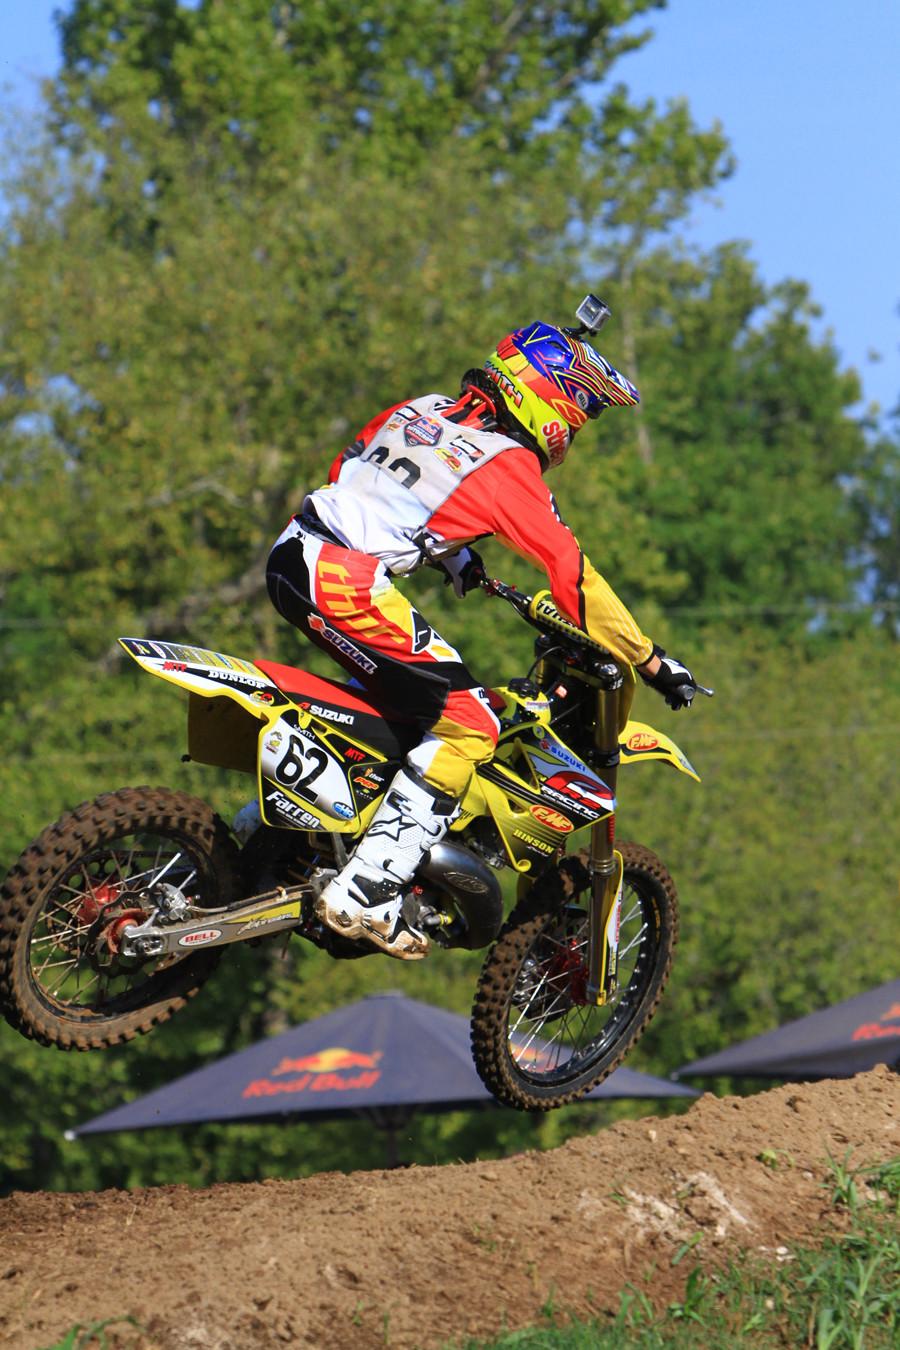 Jordan Smith - Day 3: 2012 Red Bull AMA Amateur National Motocross Championships - Motocross Pictures - Vital MX